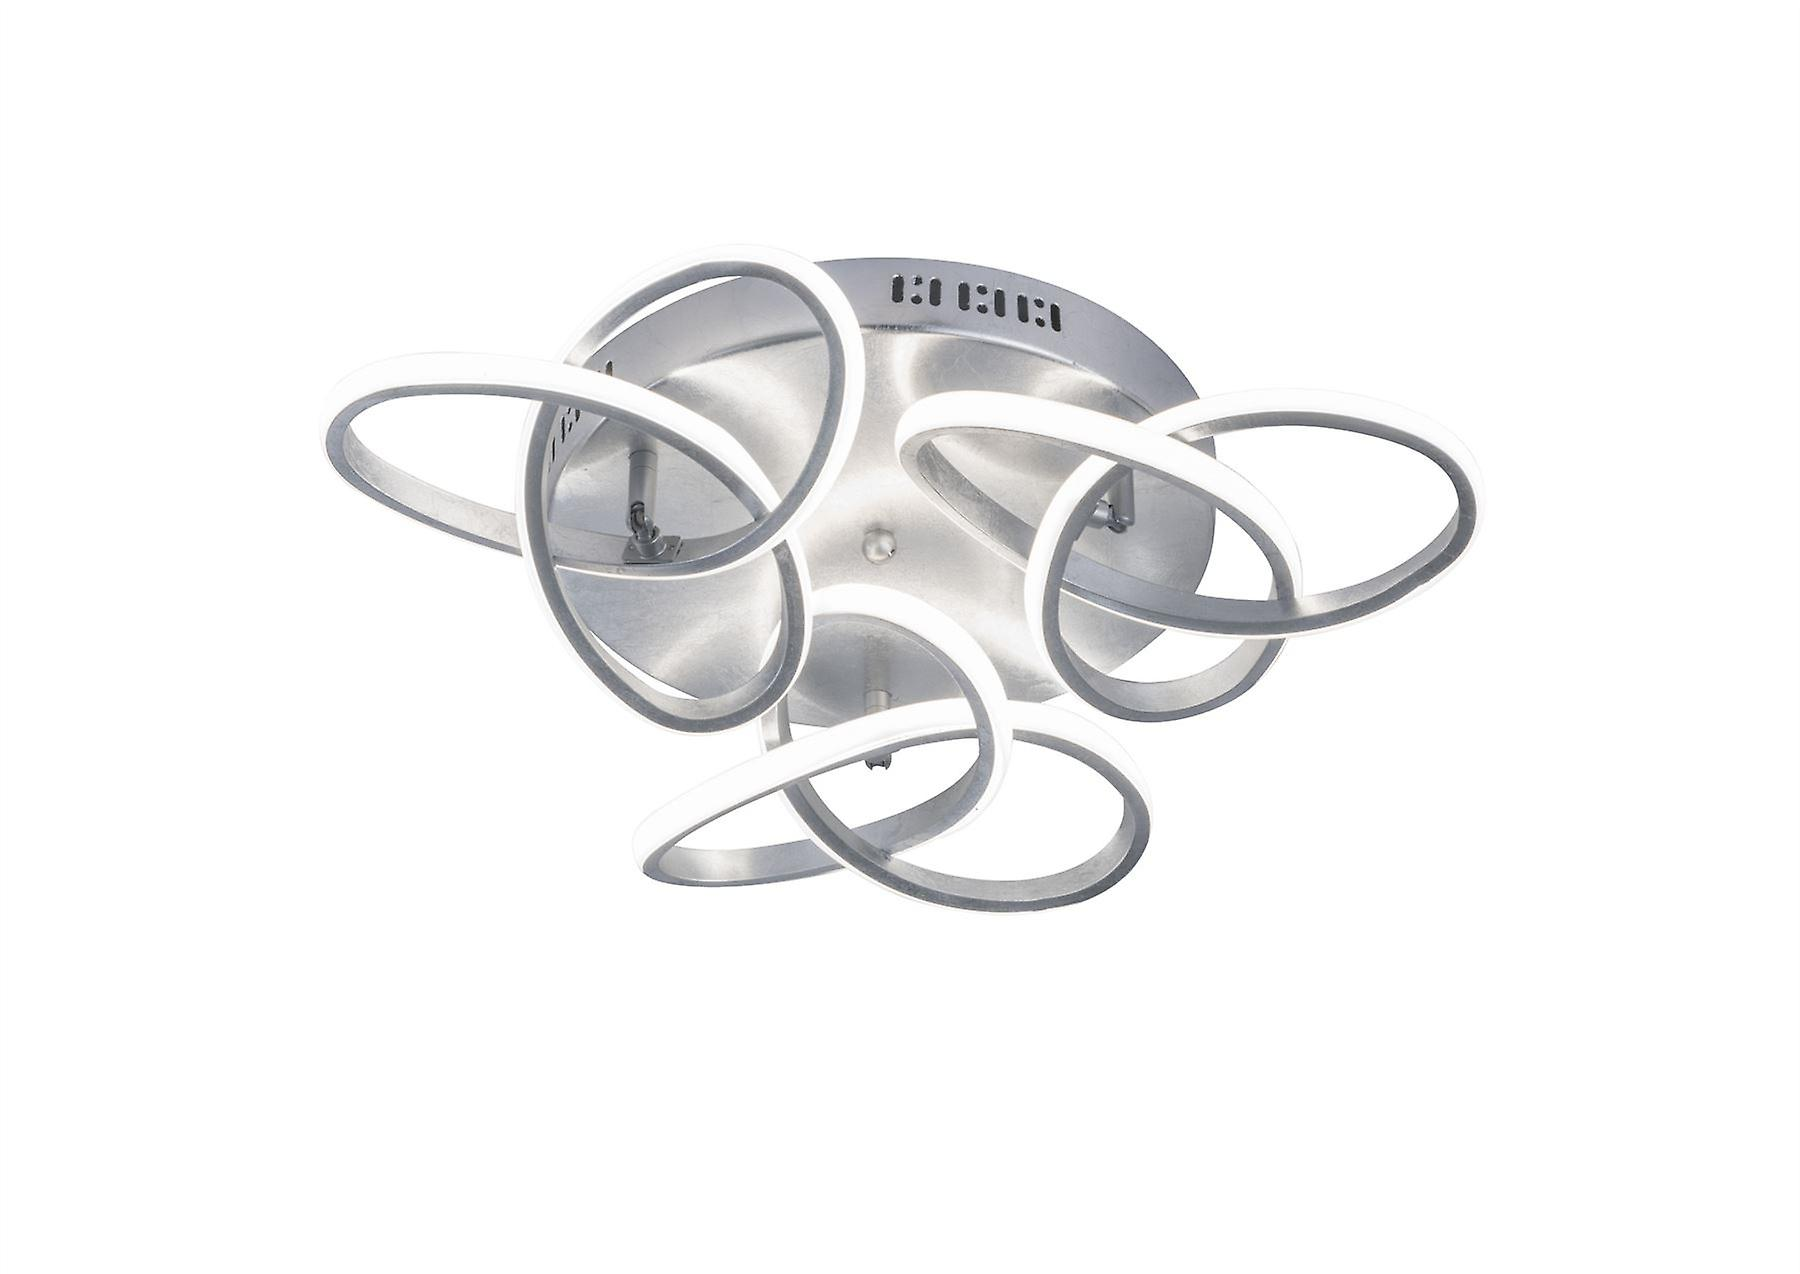 Wofi Eliot - LED Semi Flush Plafond Light argent - 9410.03.70.8000